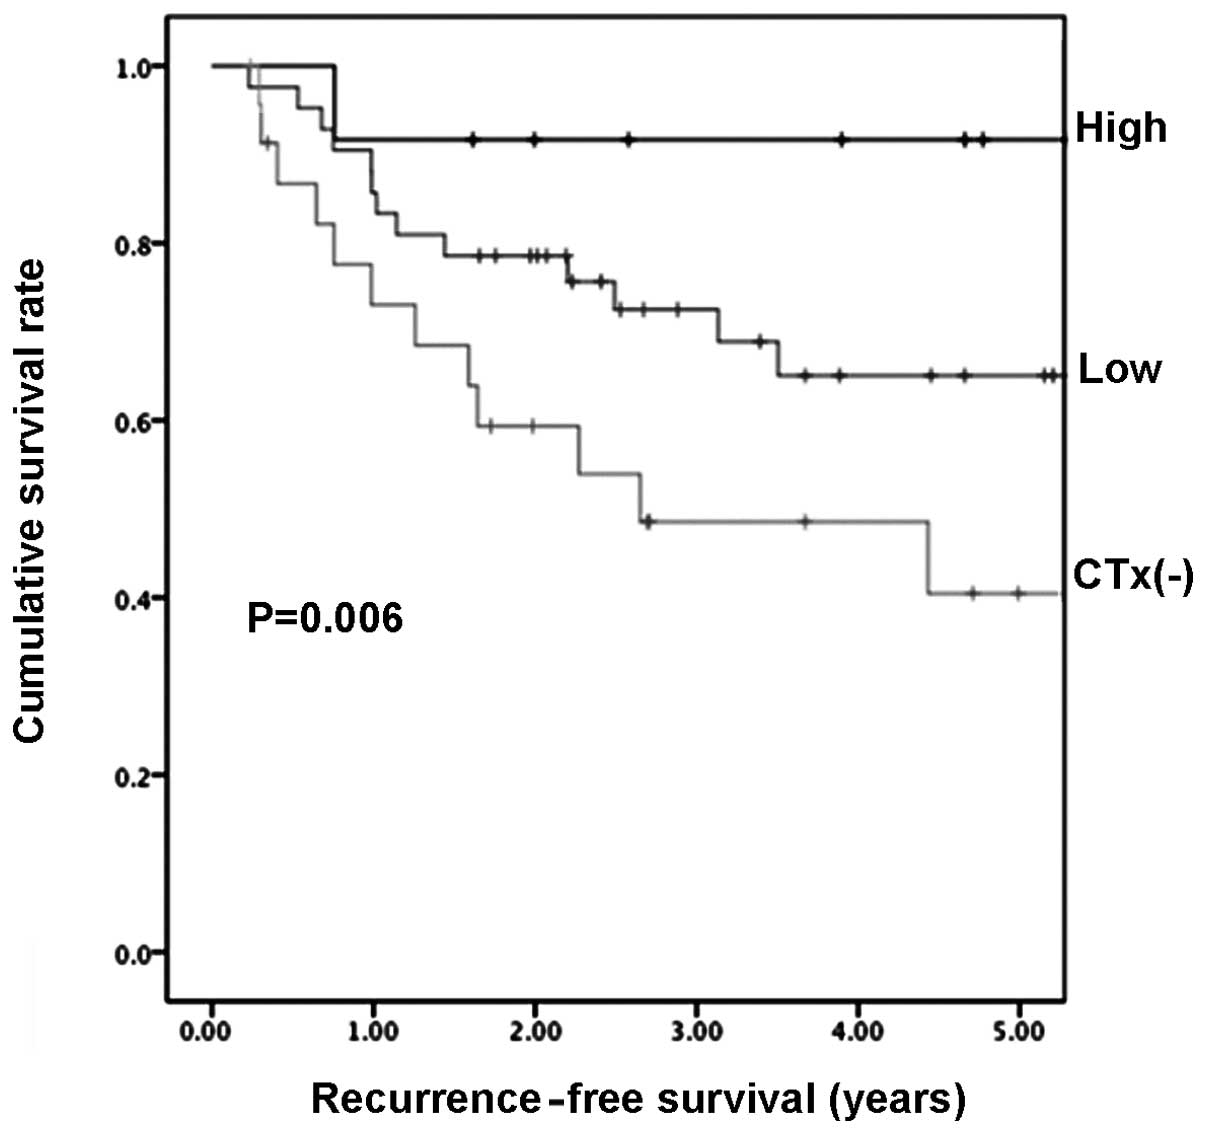 Clinical Predictive Value Of In Vitro Anticancer Drug Sensitivity Test For The The Utic